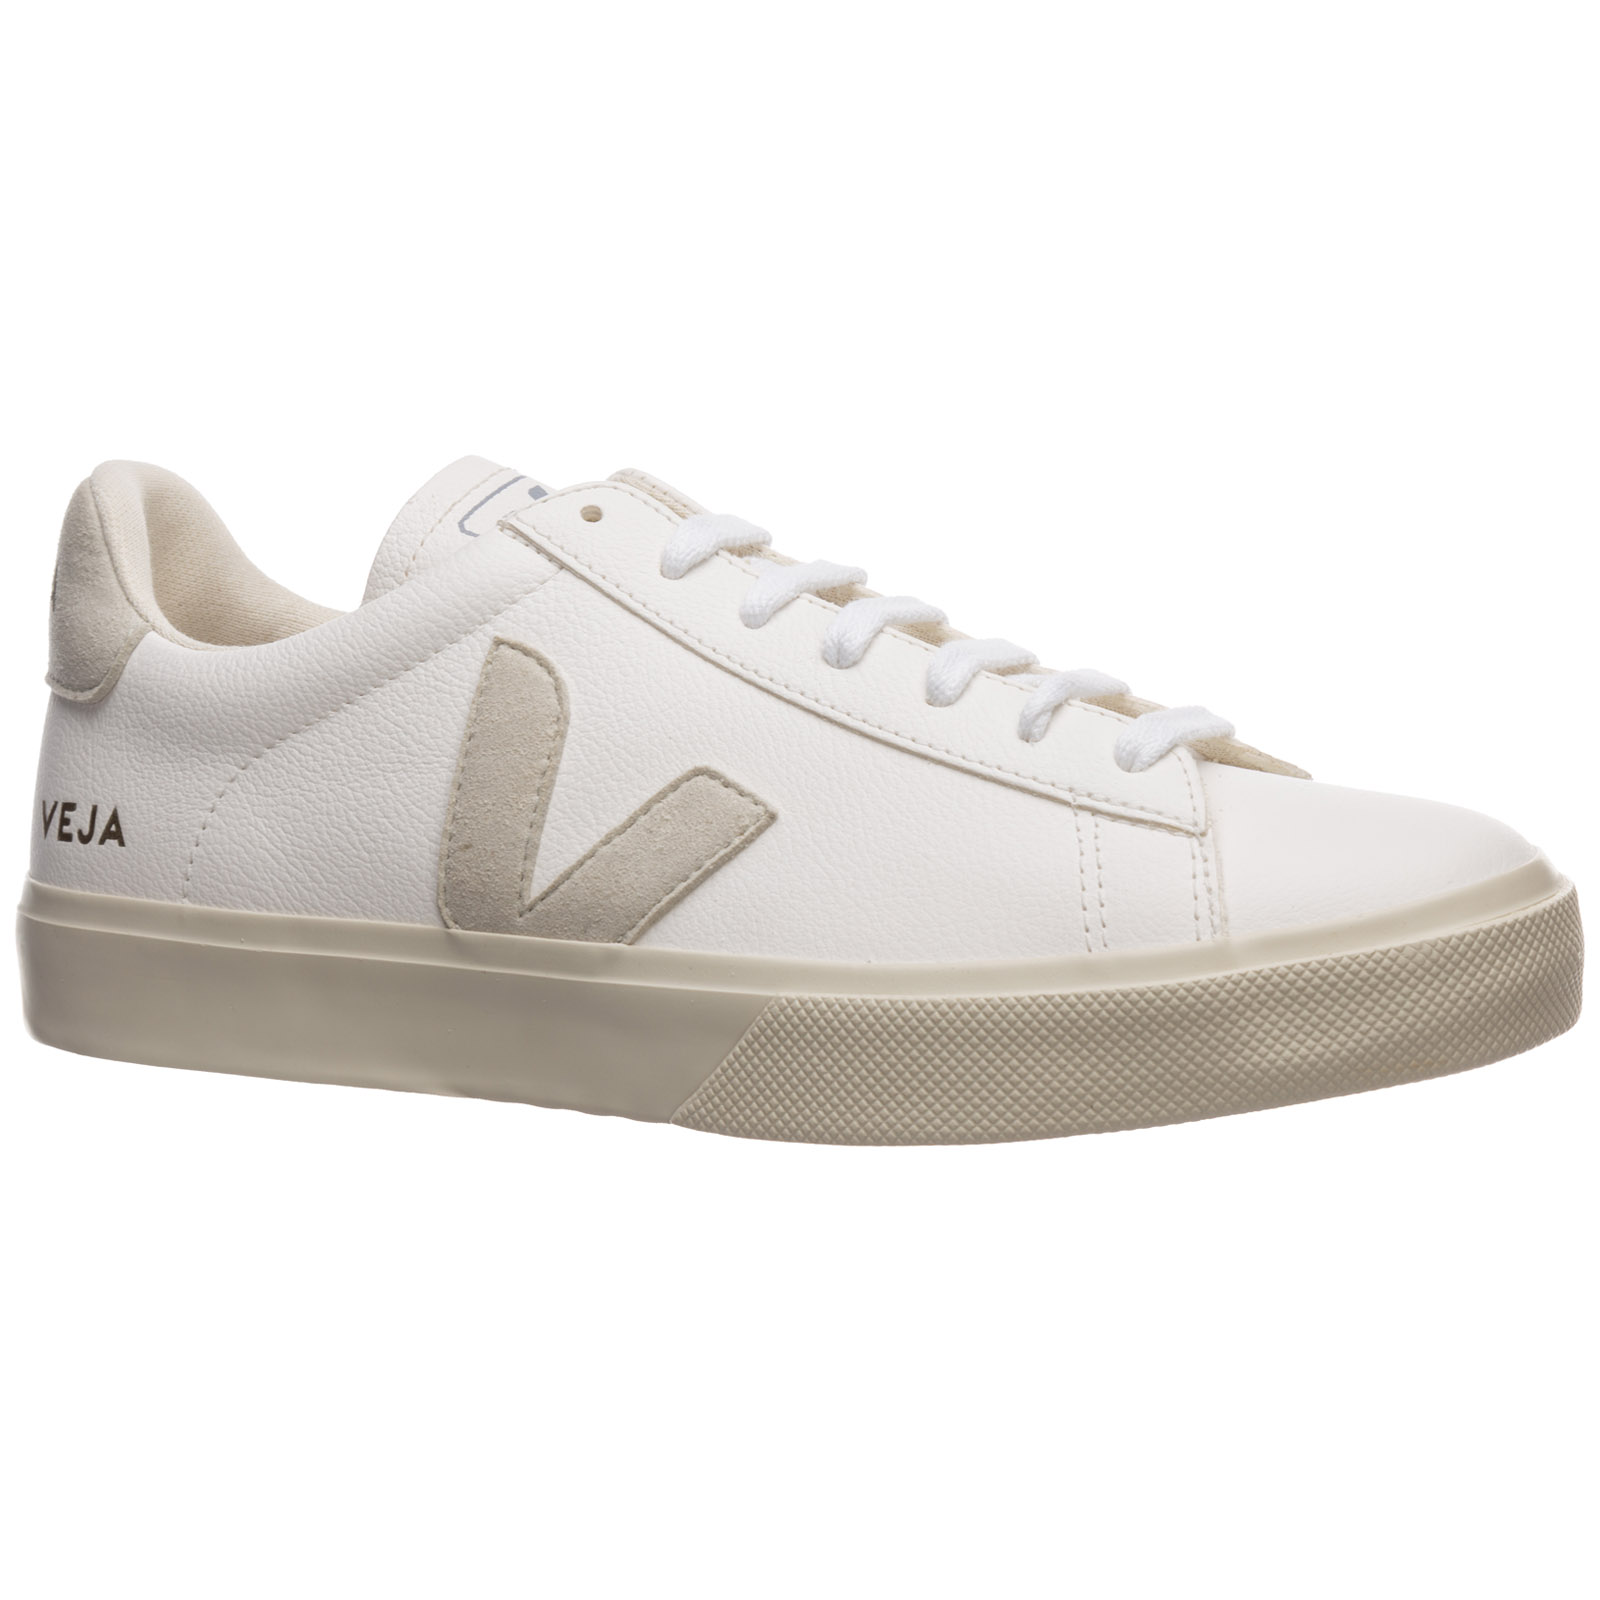 Sneakers Veja campo CP051945 white